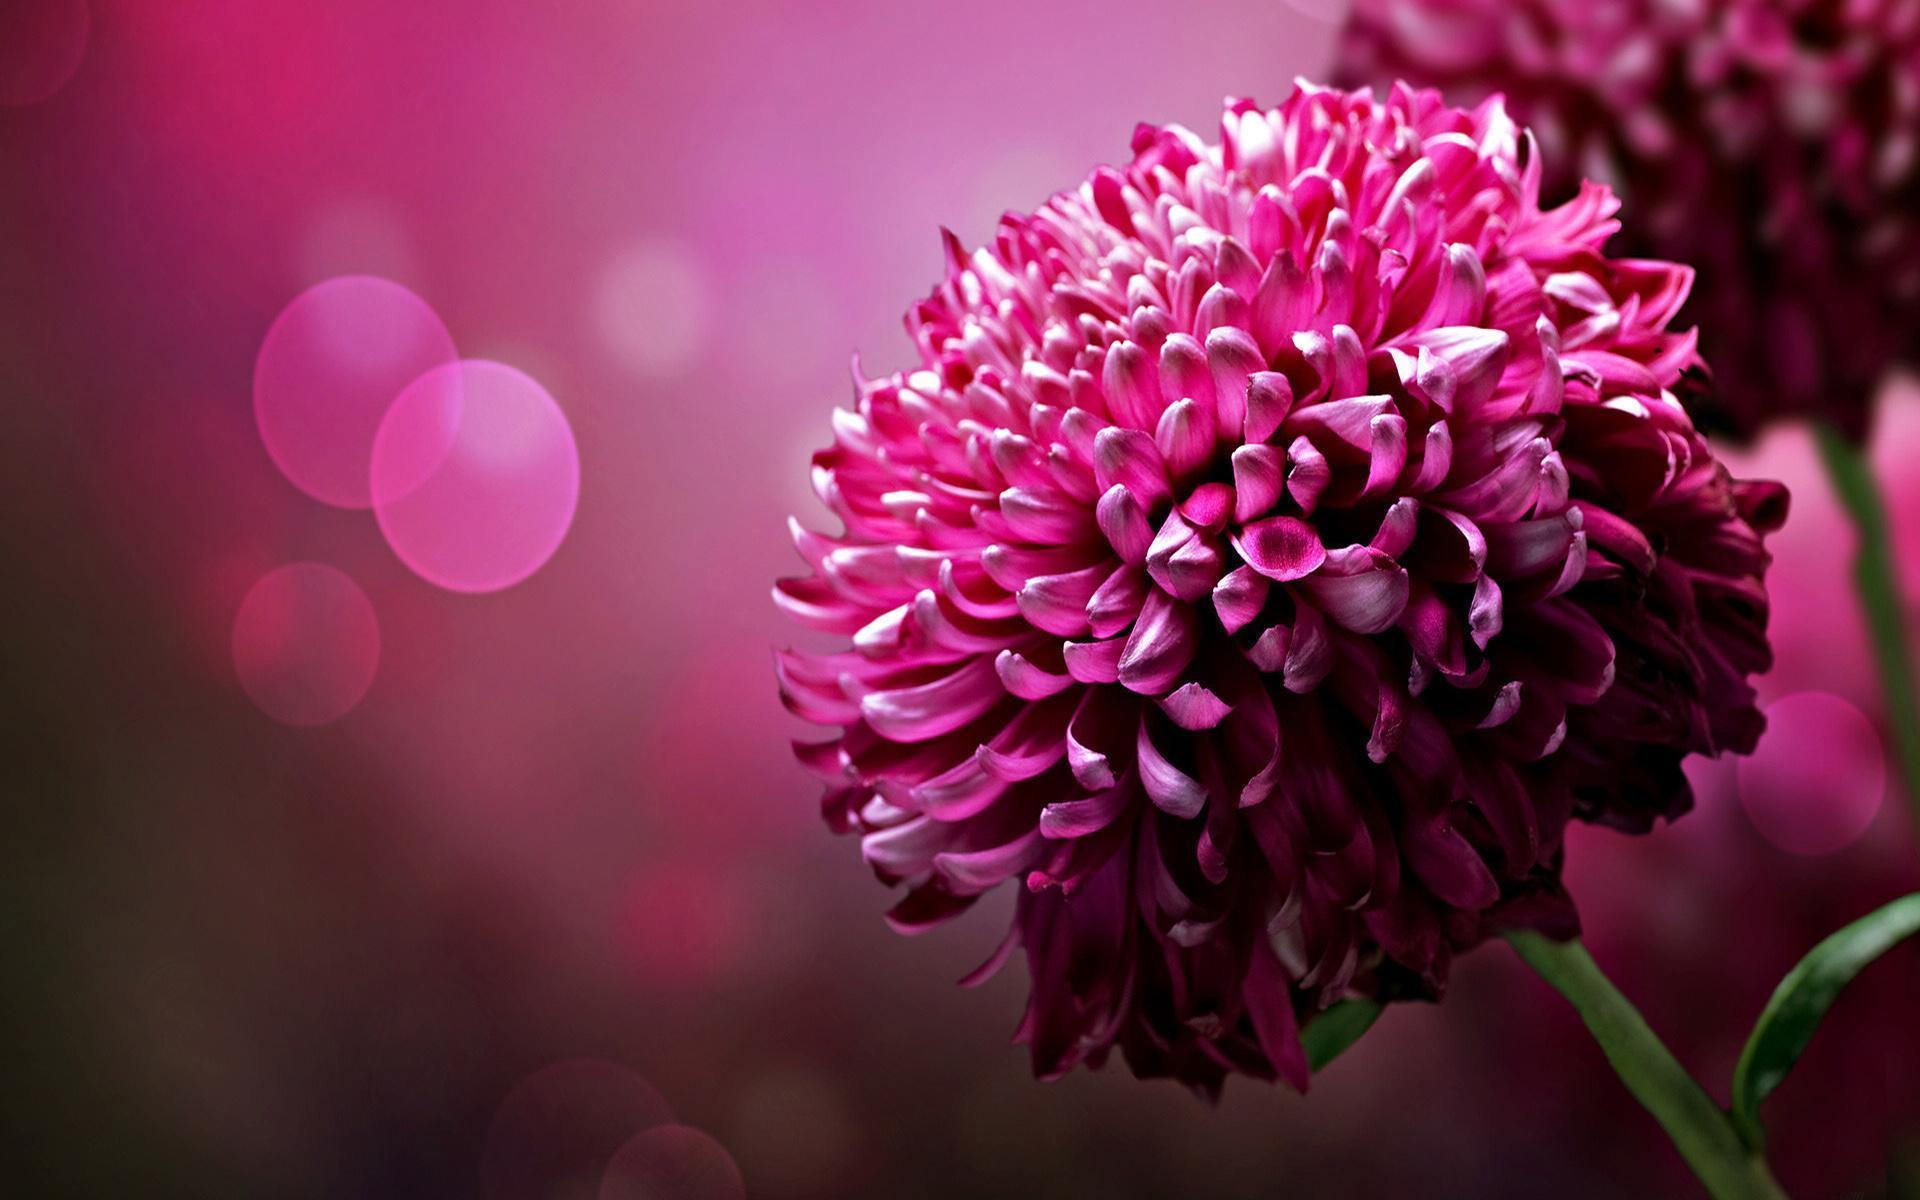 flowers image desktop backgrounds  wallpaper cave, Beautiful flower